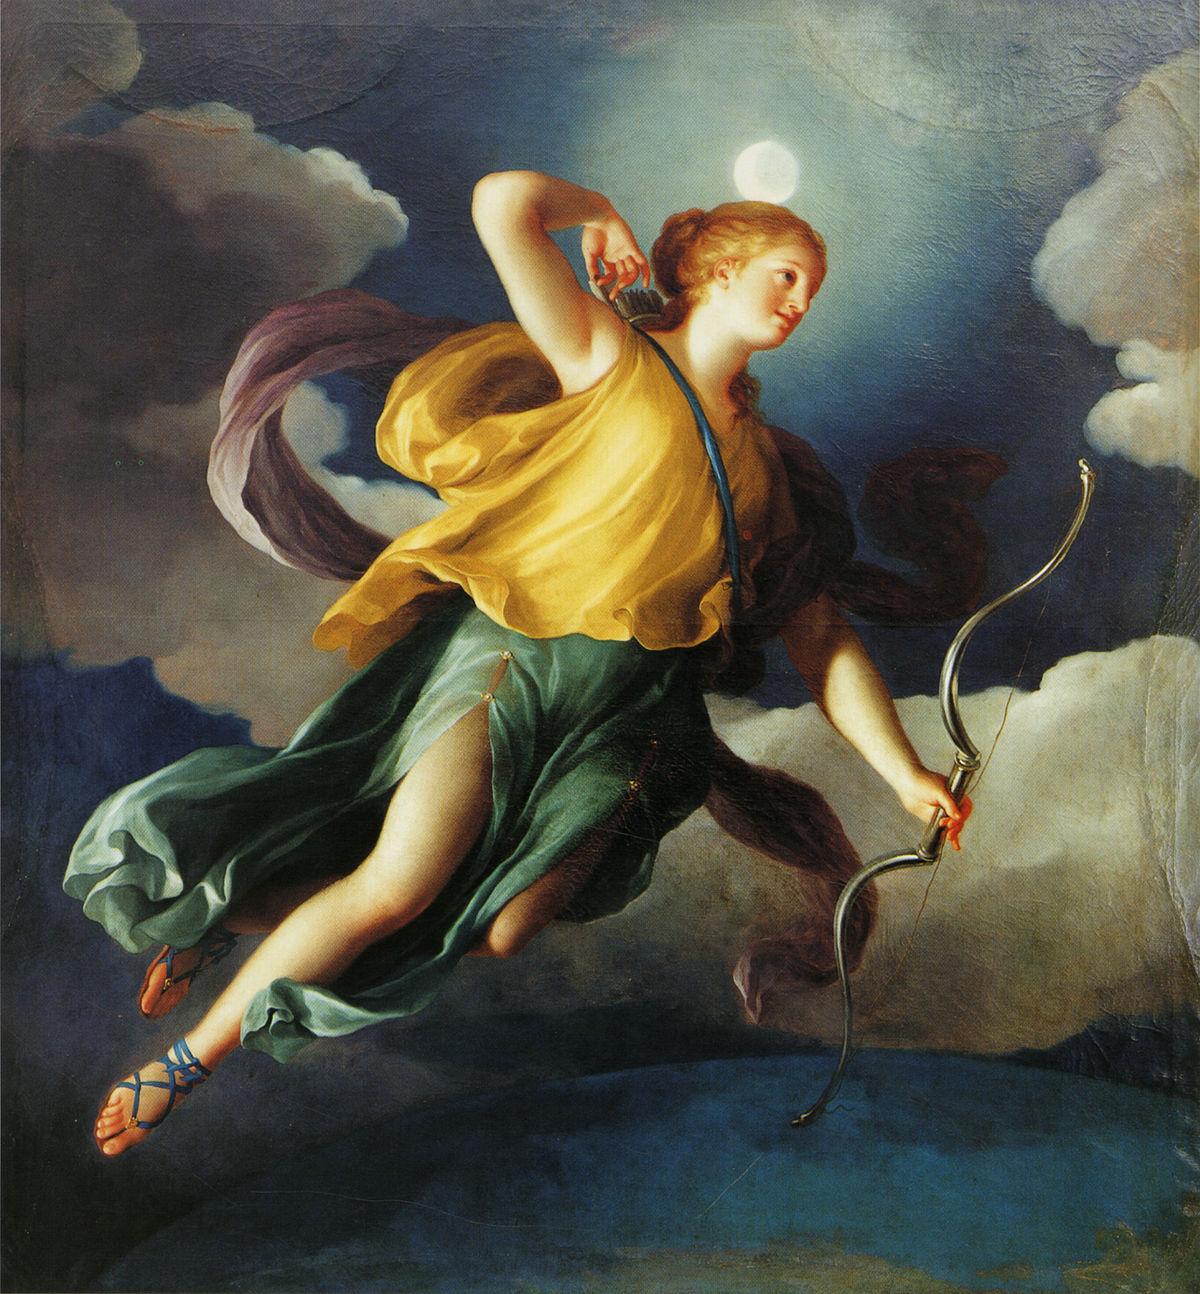 Mengs, Diana als Personifikation der Nacht.jpg